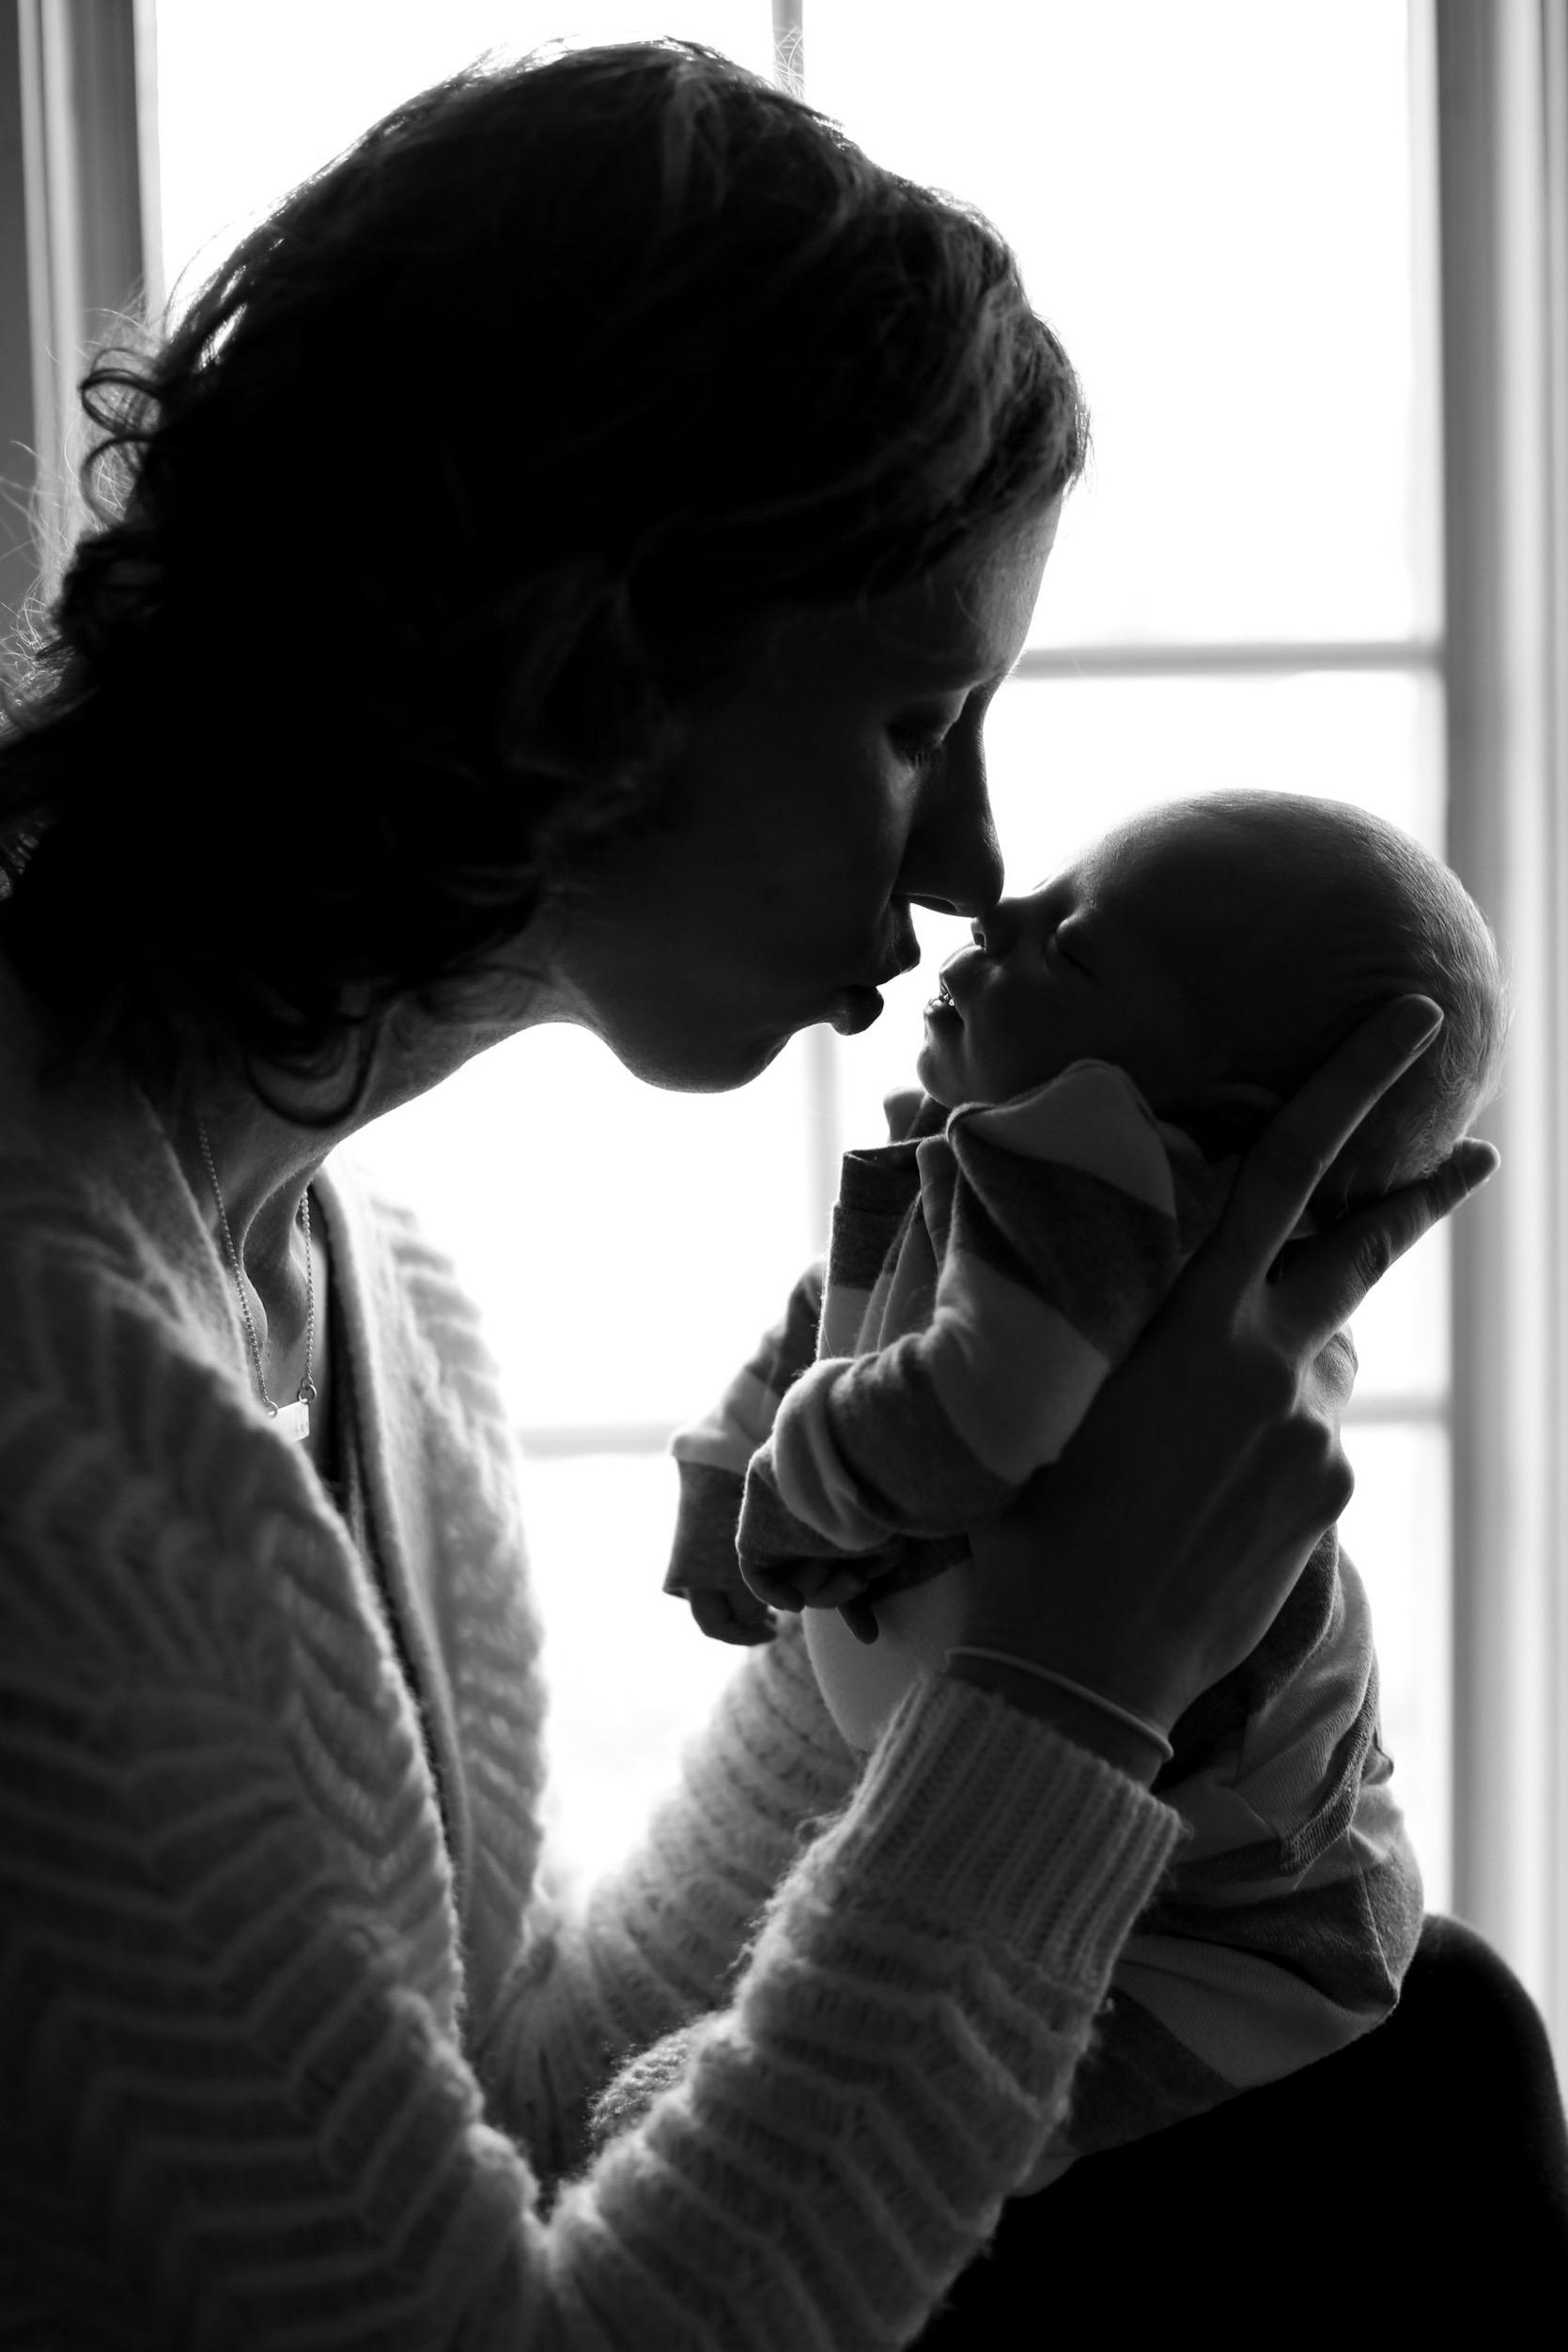 Micah Postma Newborn Photo Shoot at Home (39 of 88).jpg